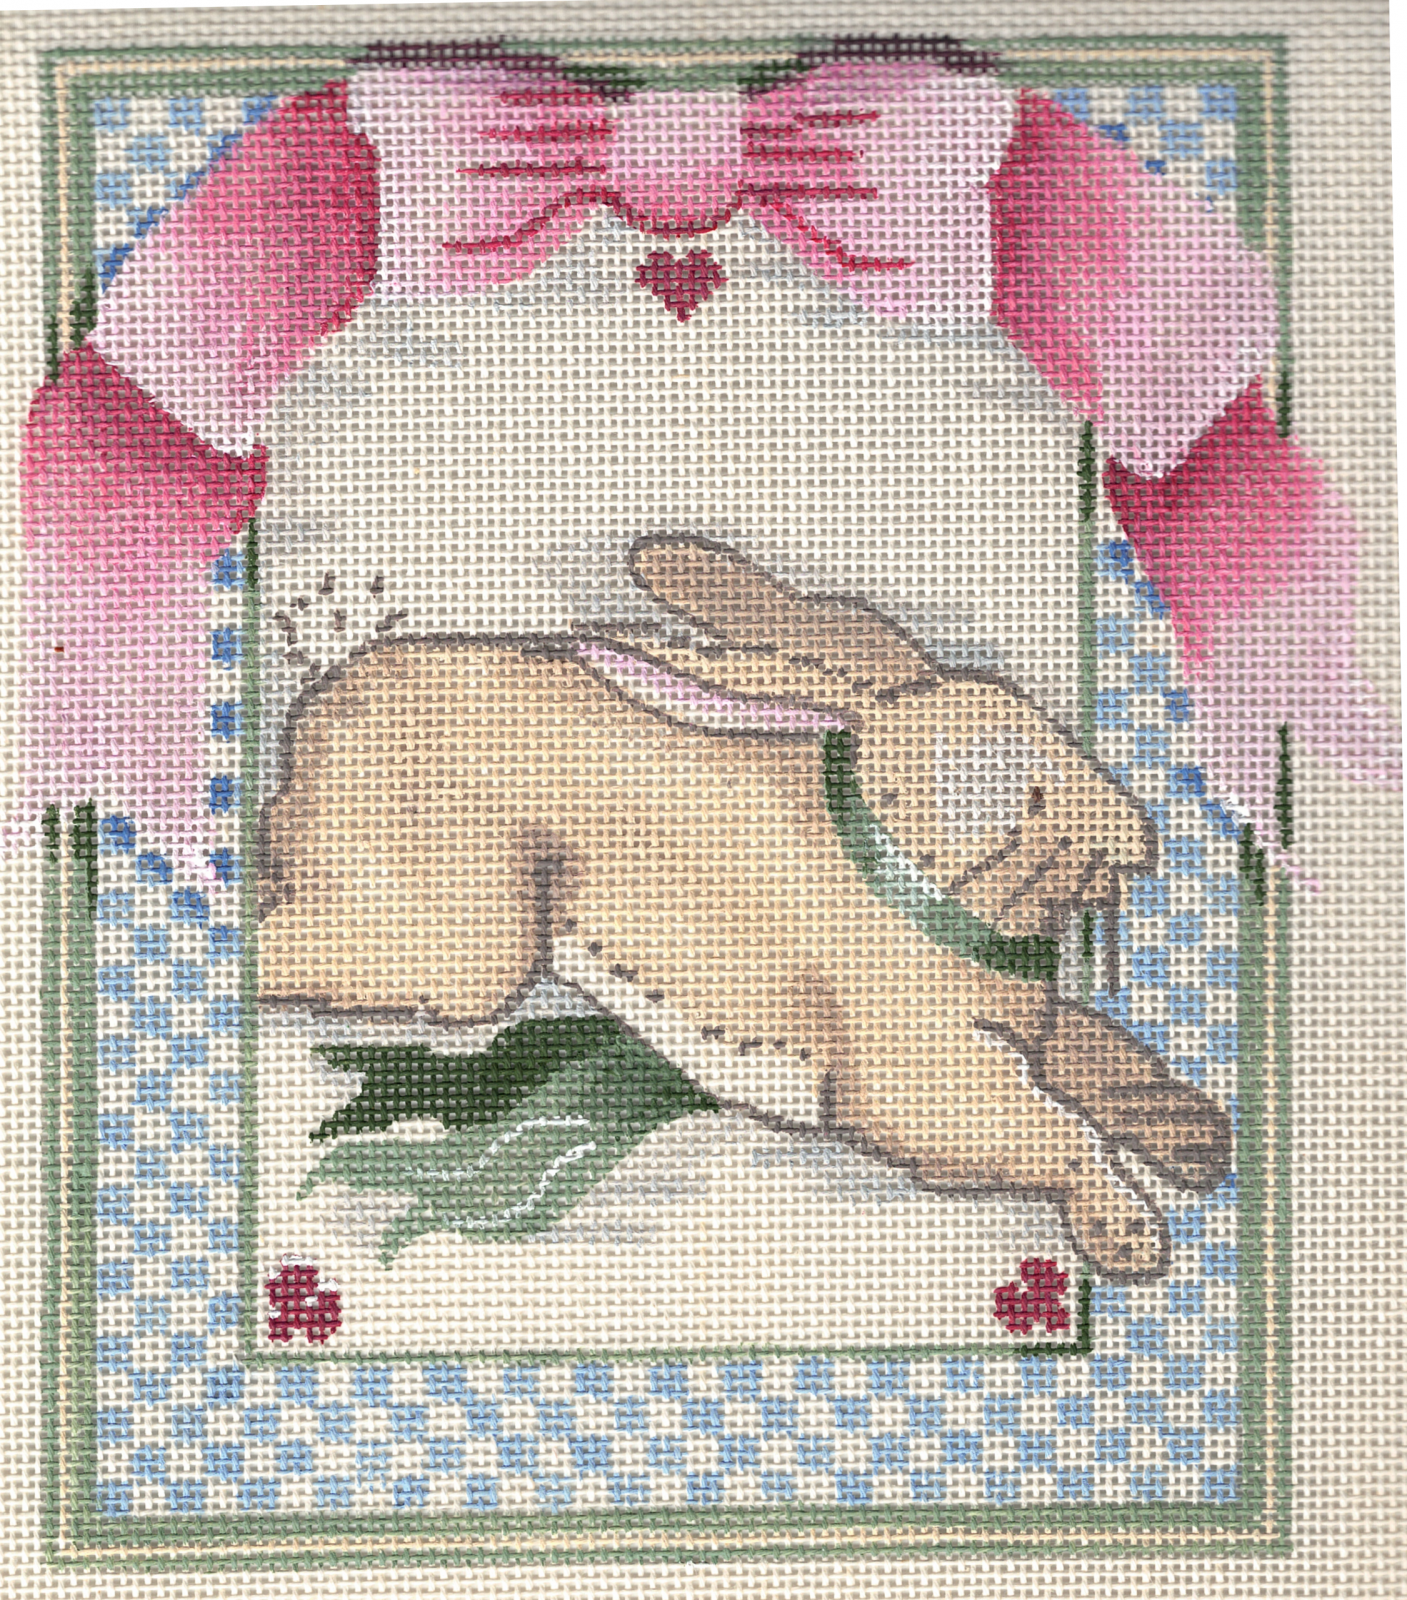 Jumping Bunny - 14M